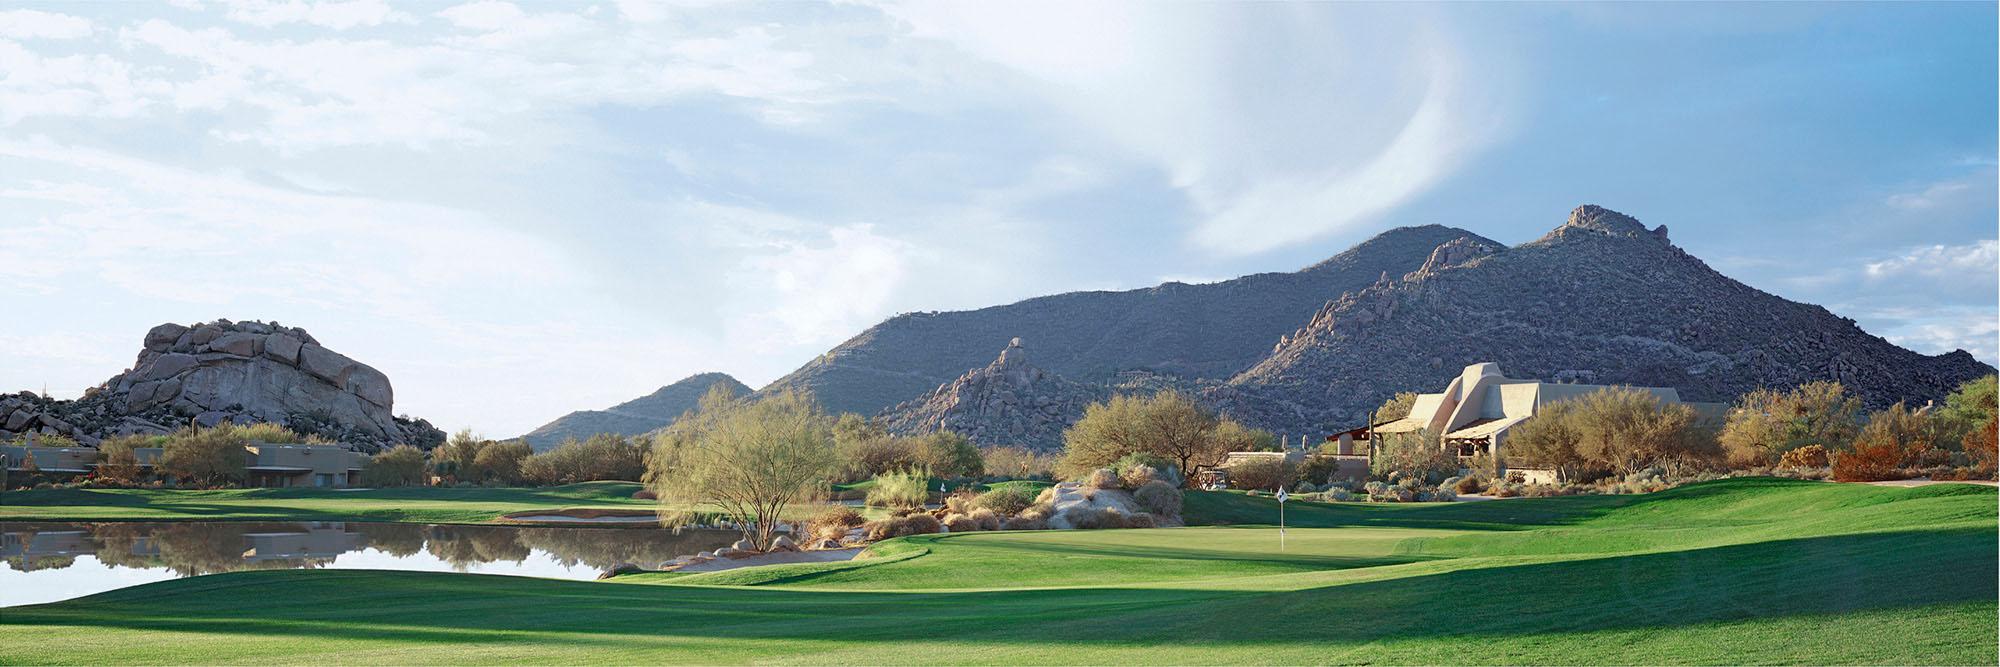 Golf Course Image - Boulders No. 18